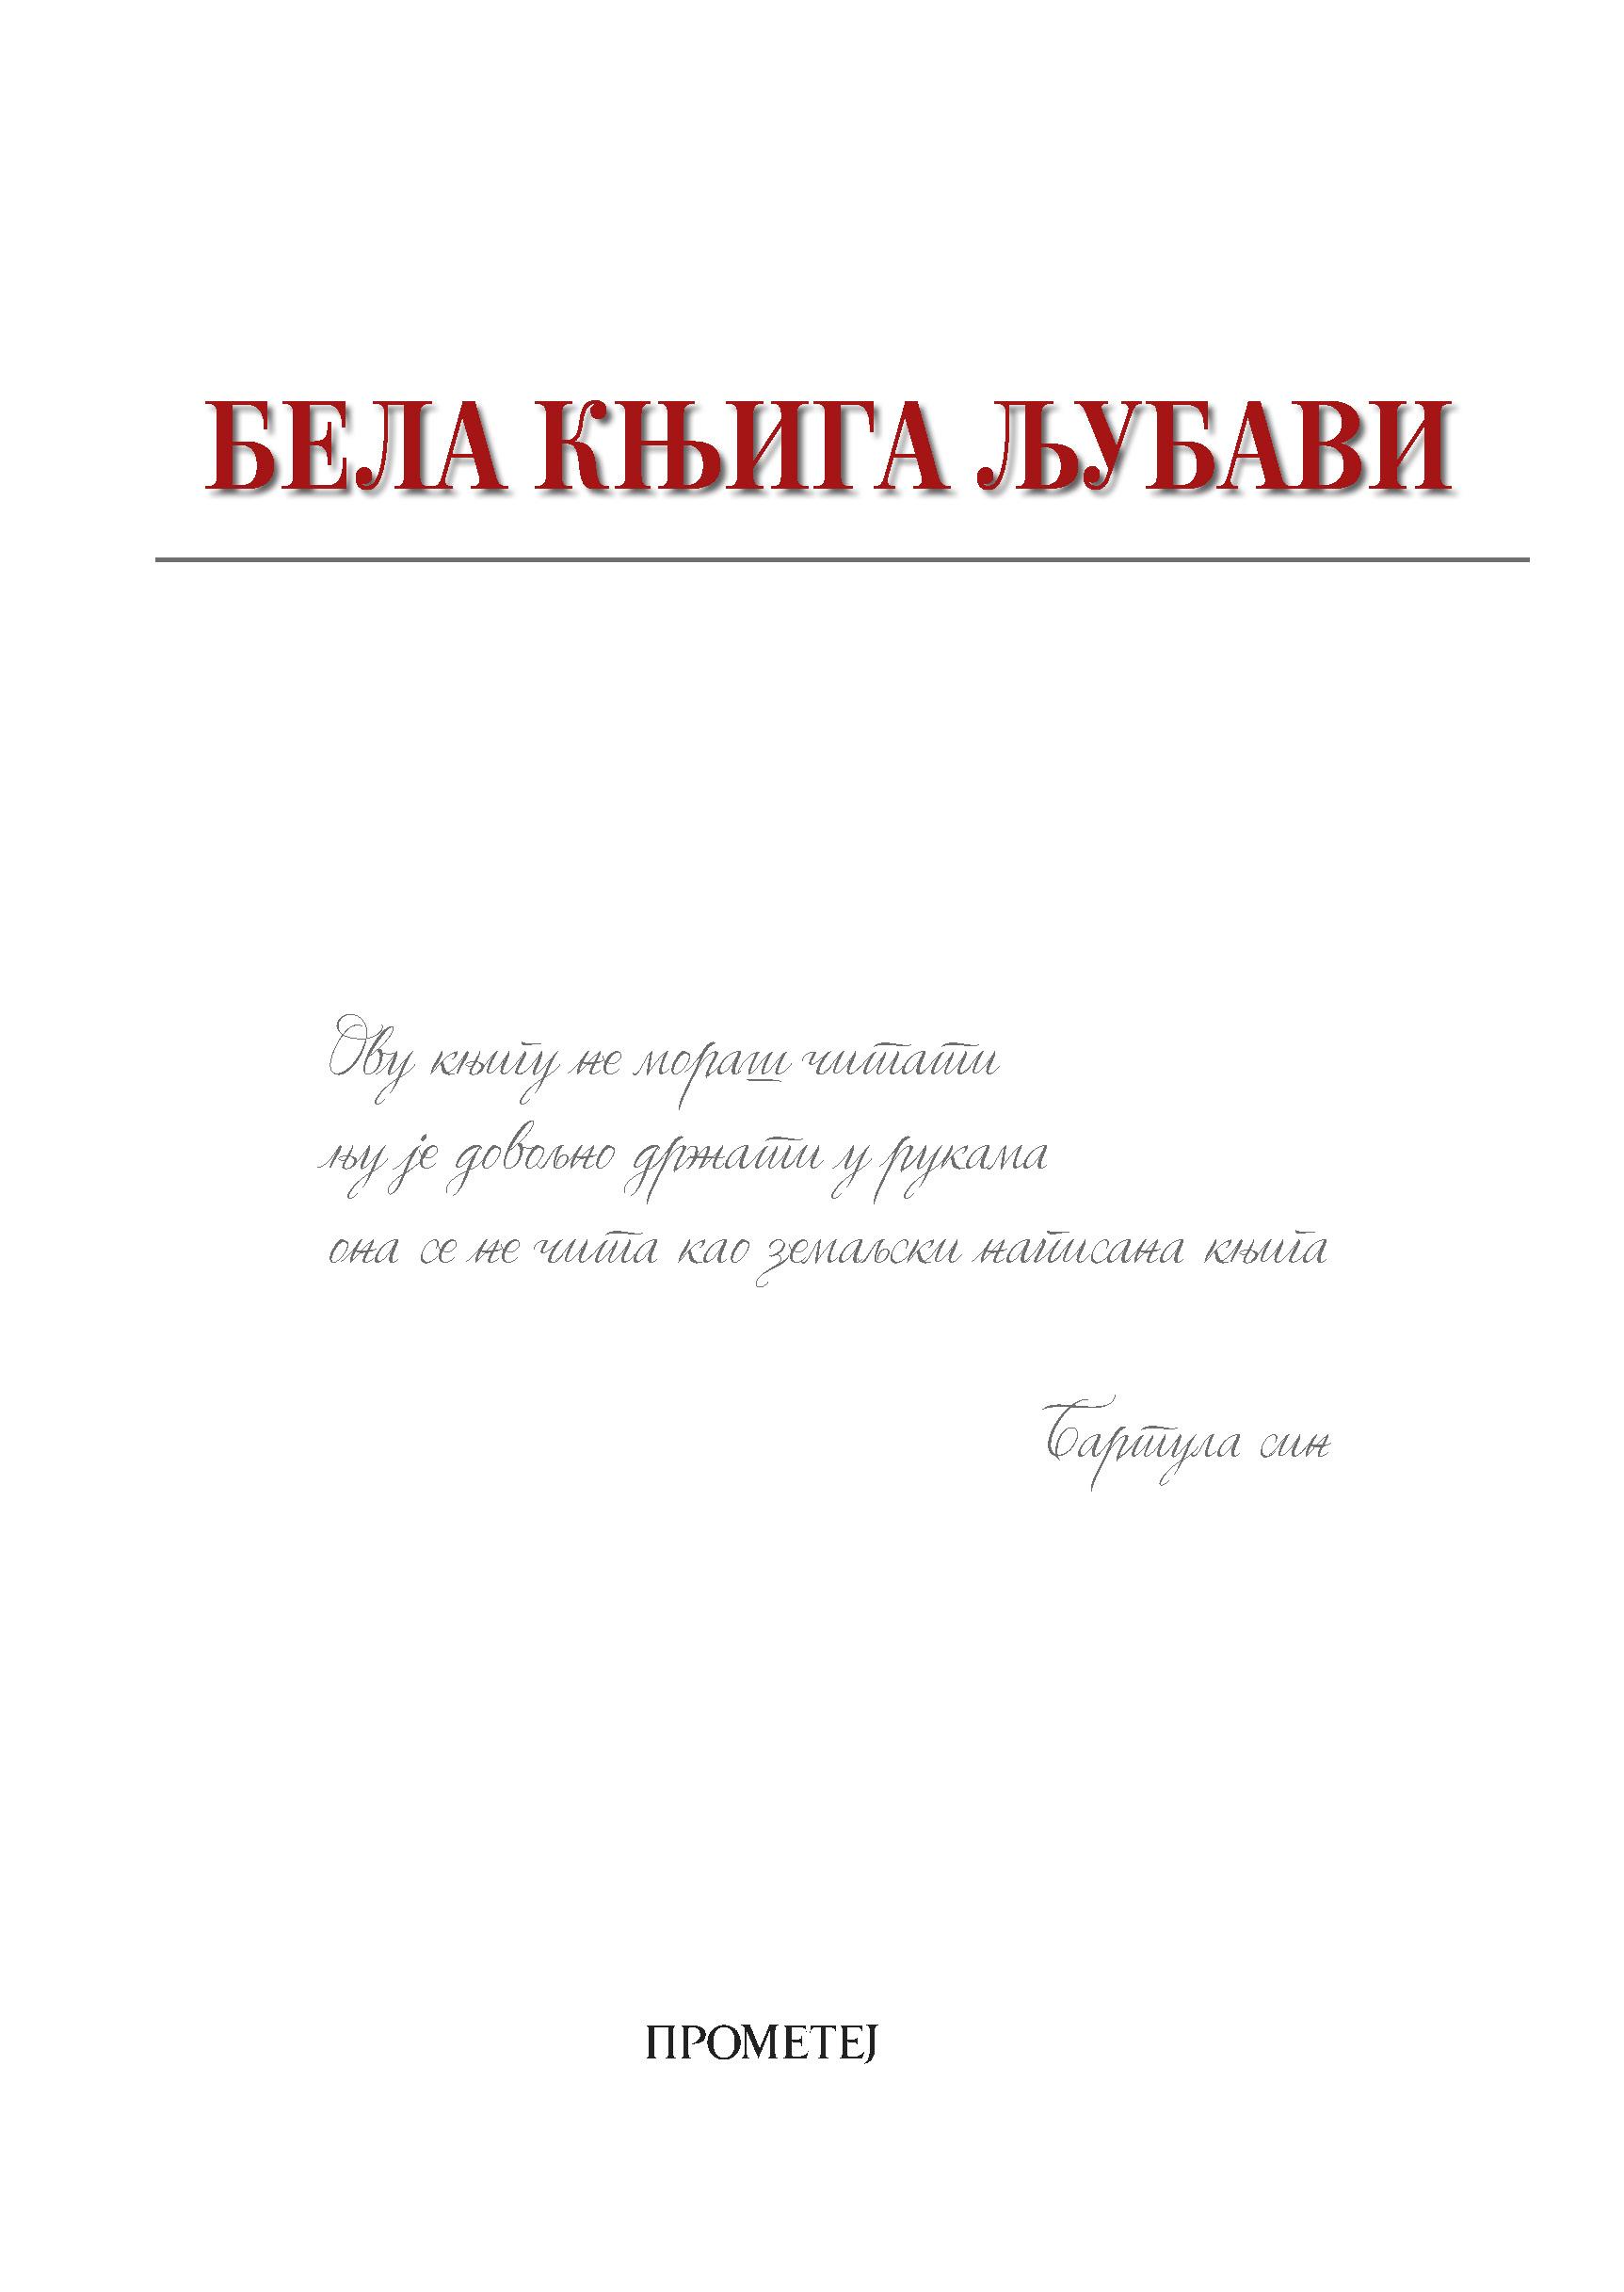 Бела књига љубави